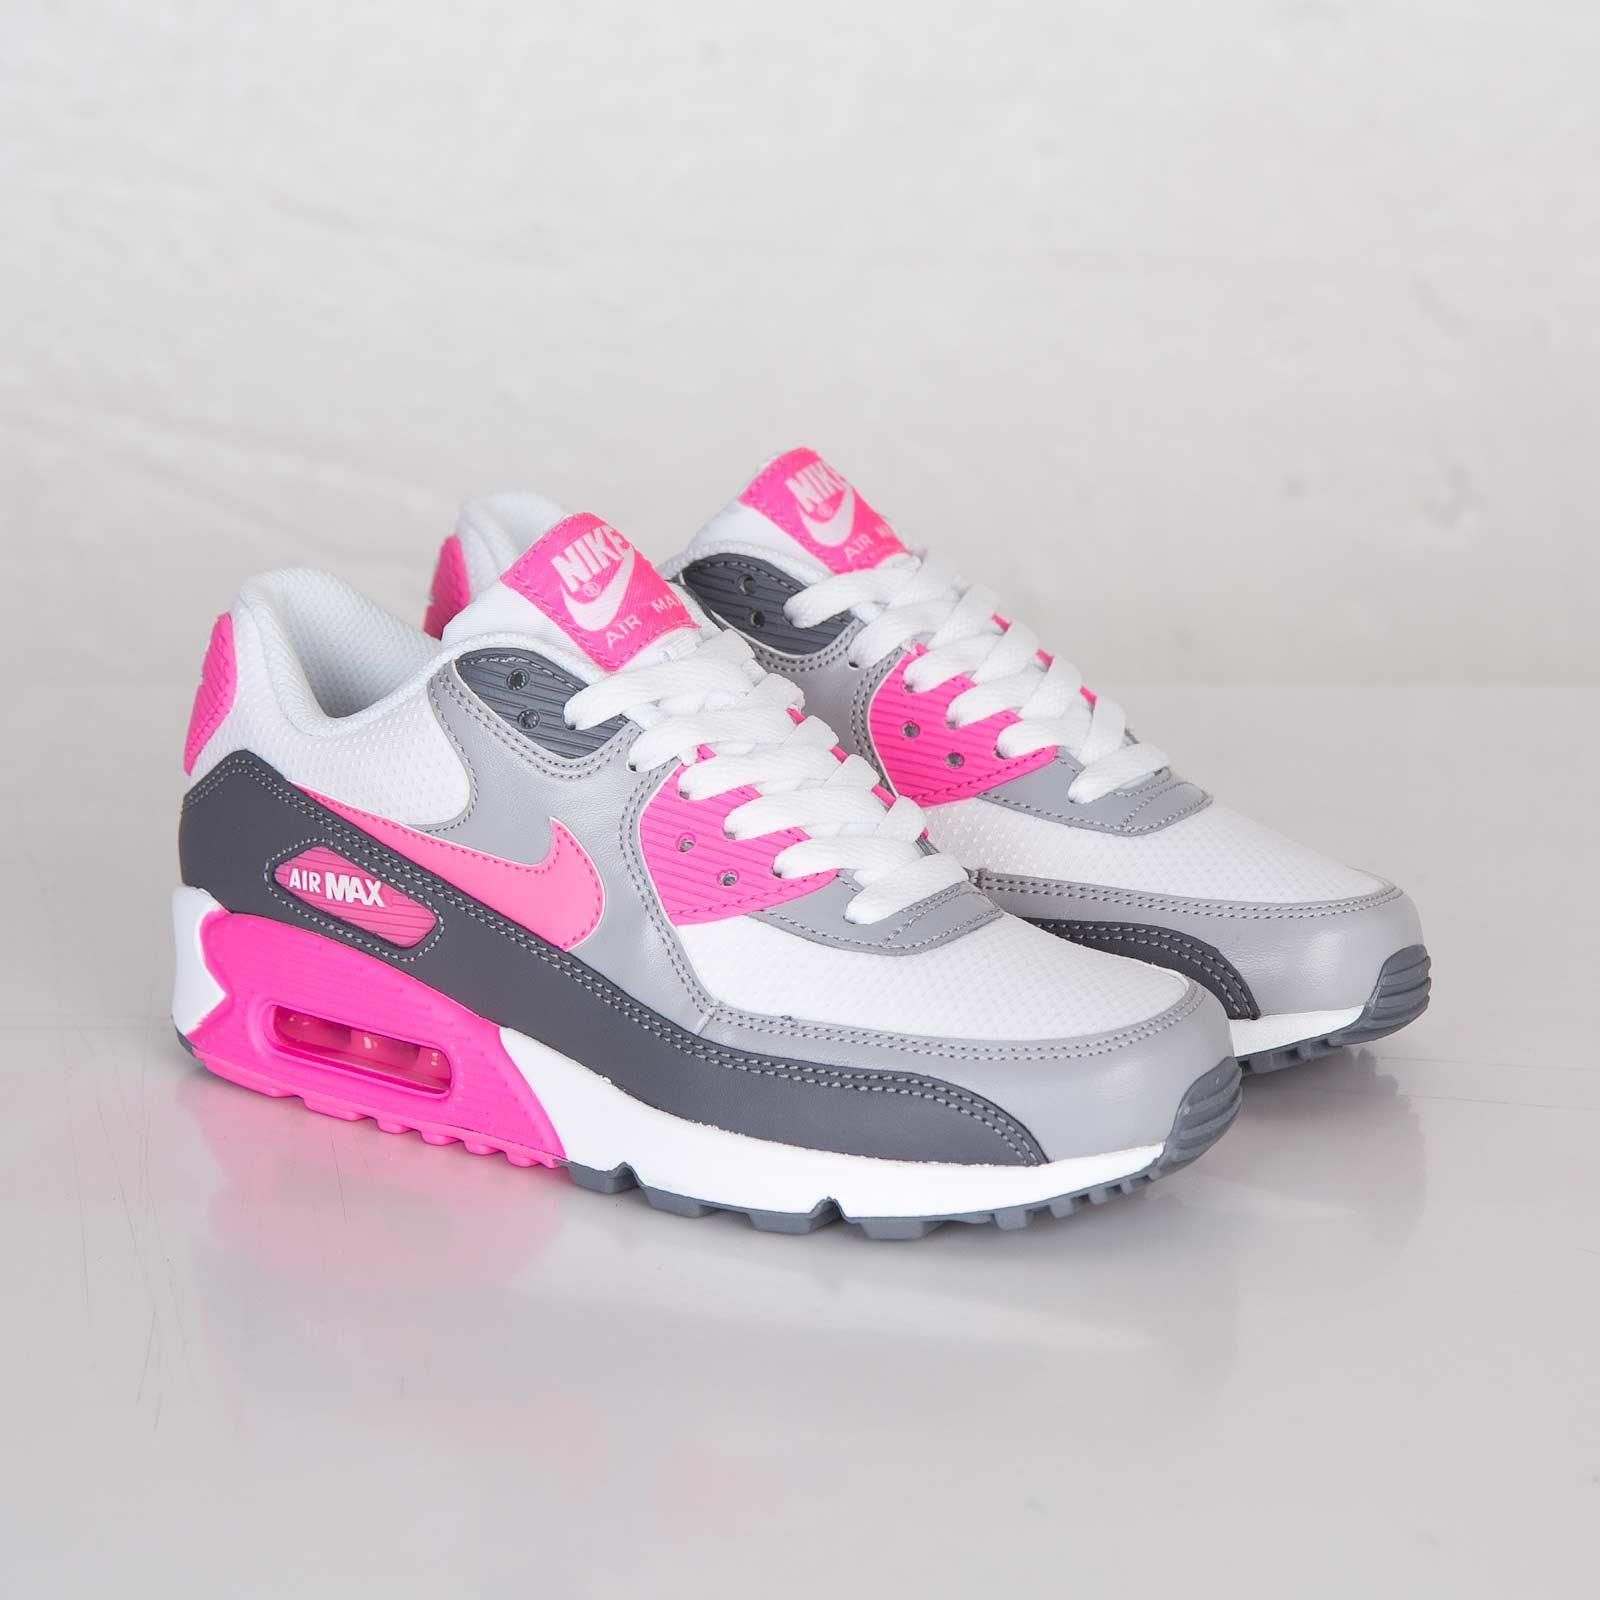 Nike Wmns Air Max 90 Essential 616730 102 Sneakersnstuff